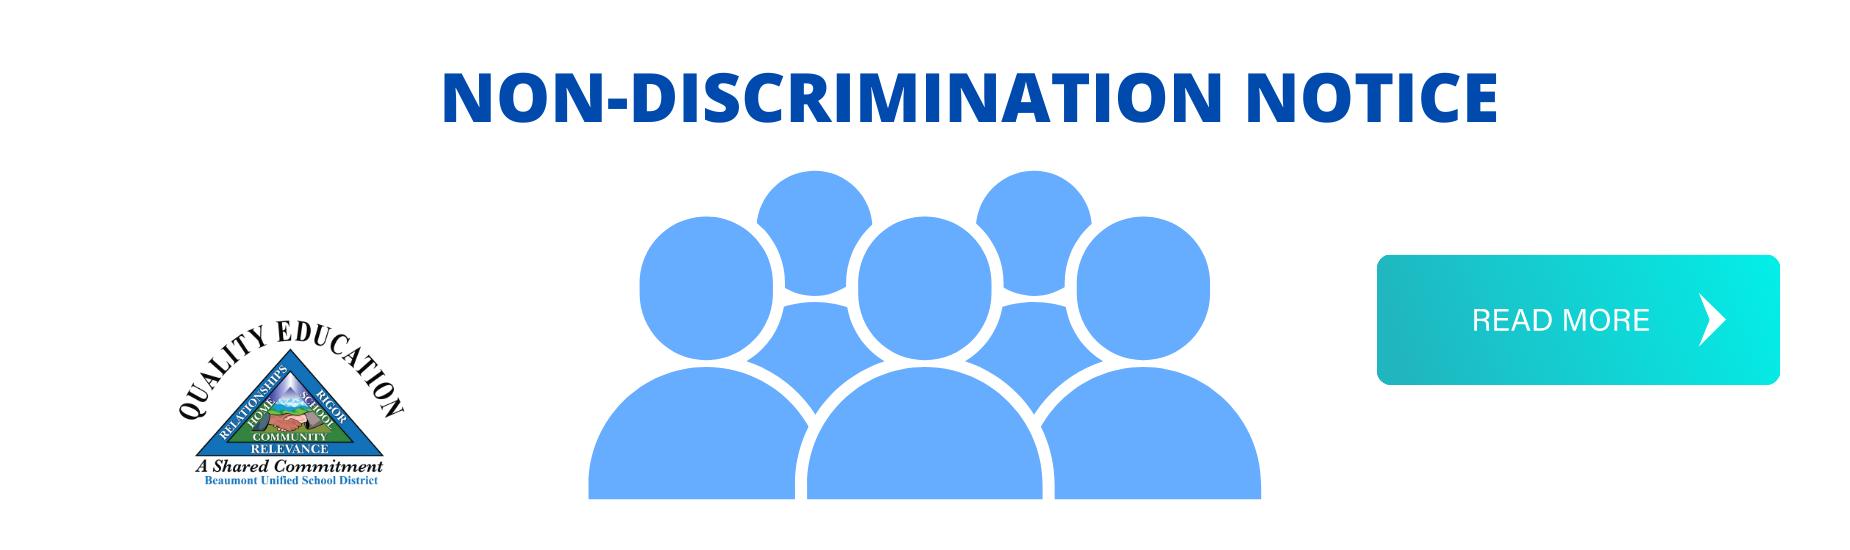 Non-Discrimination Notice